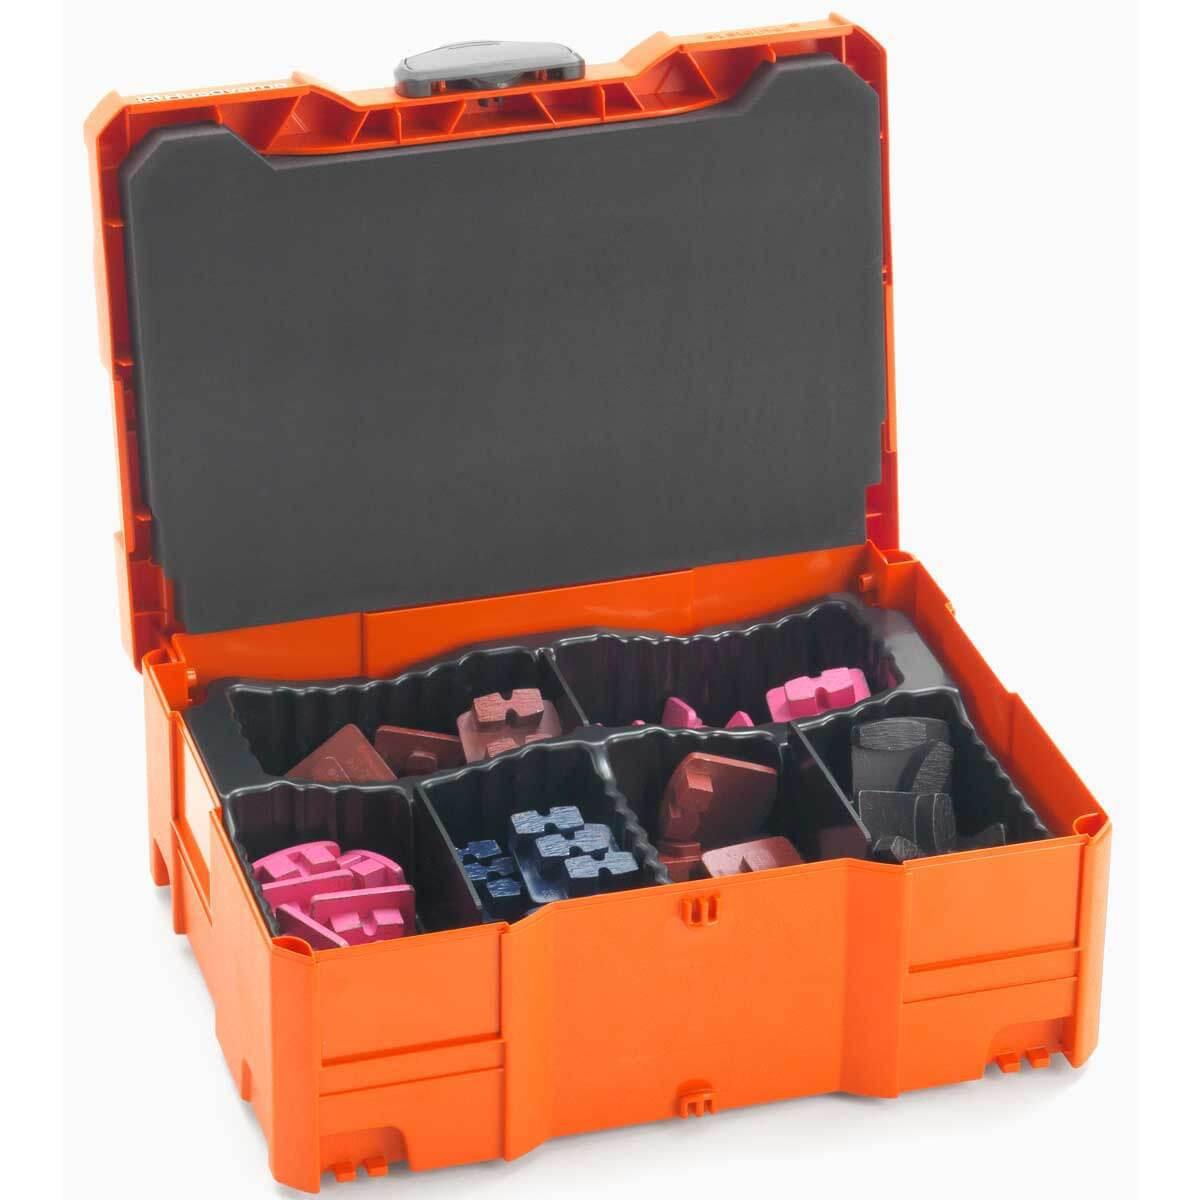 Husqvarna Accessories For Surface Preparation Tool Box